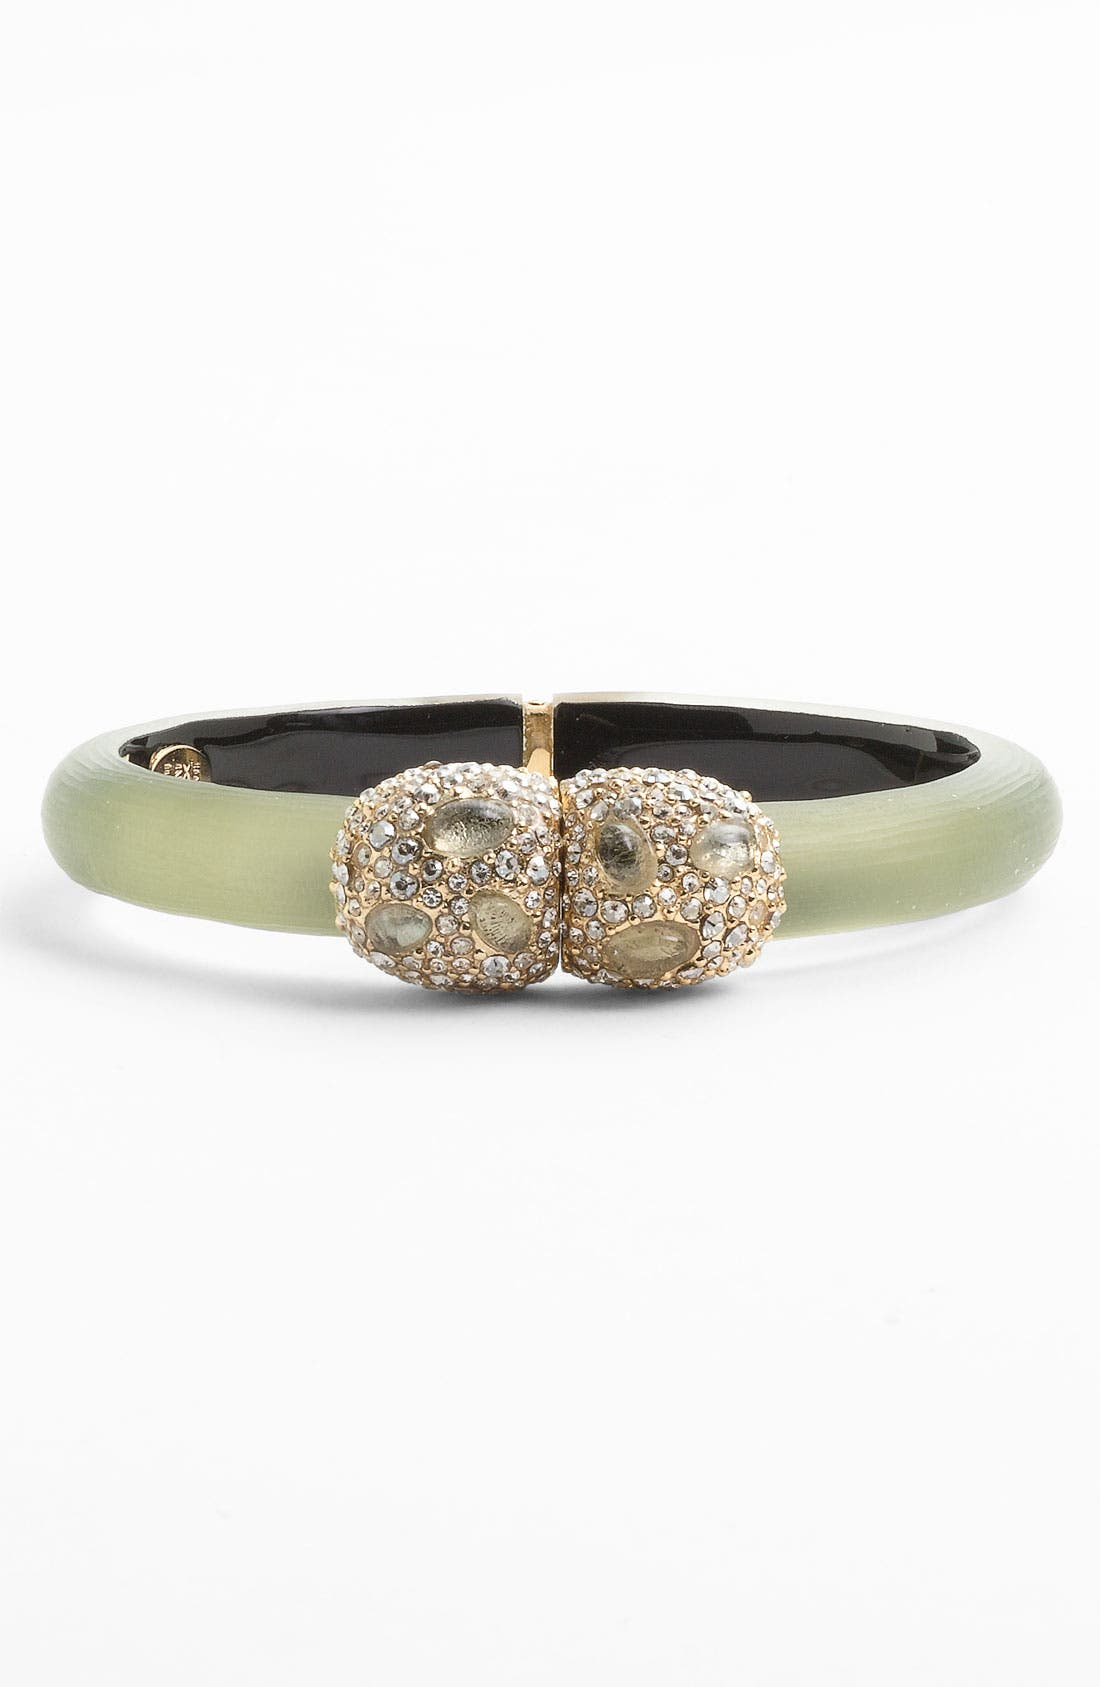 Main Image - Alexis Bittar 'Modular' Small Pebble Clasp Hinged Bracelet